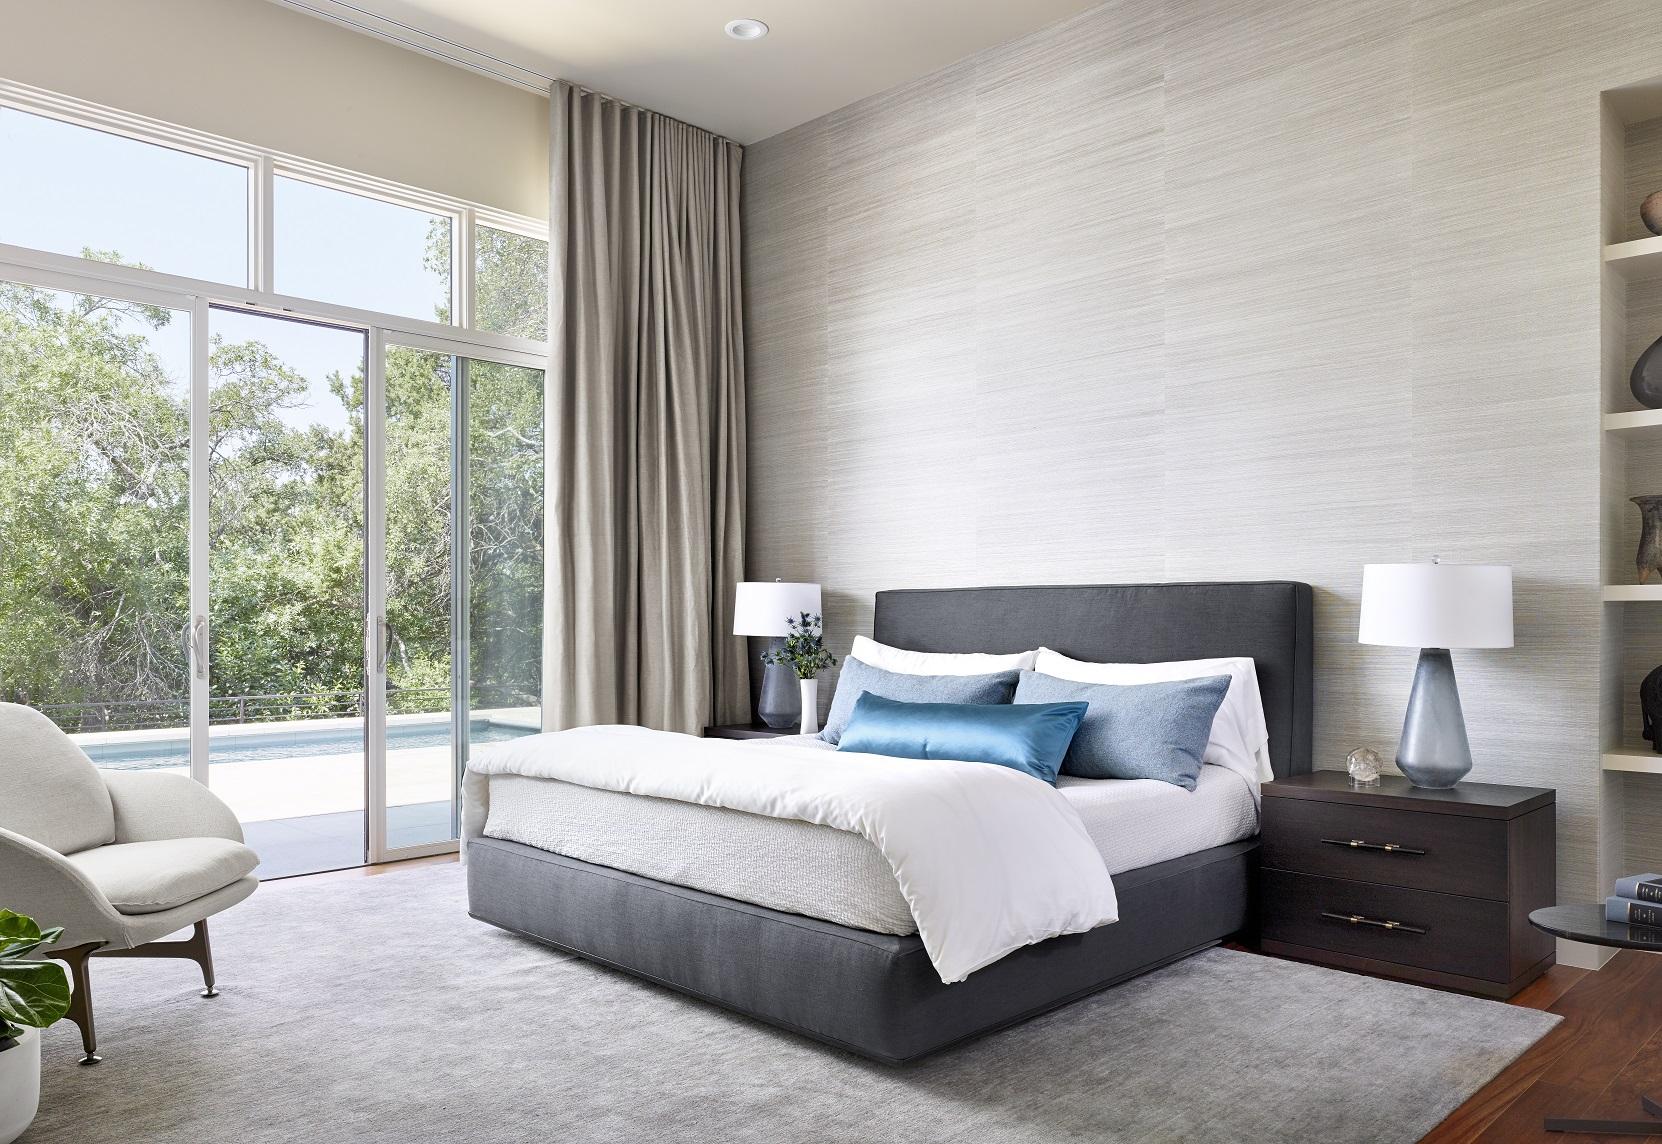 Rollingwood residence - master bedroom